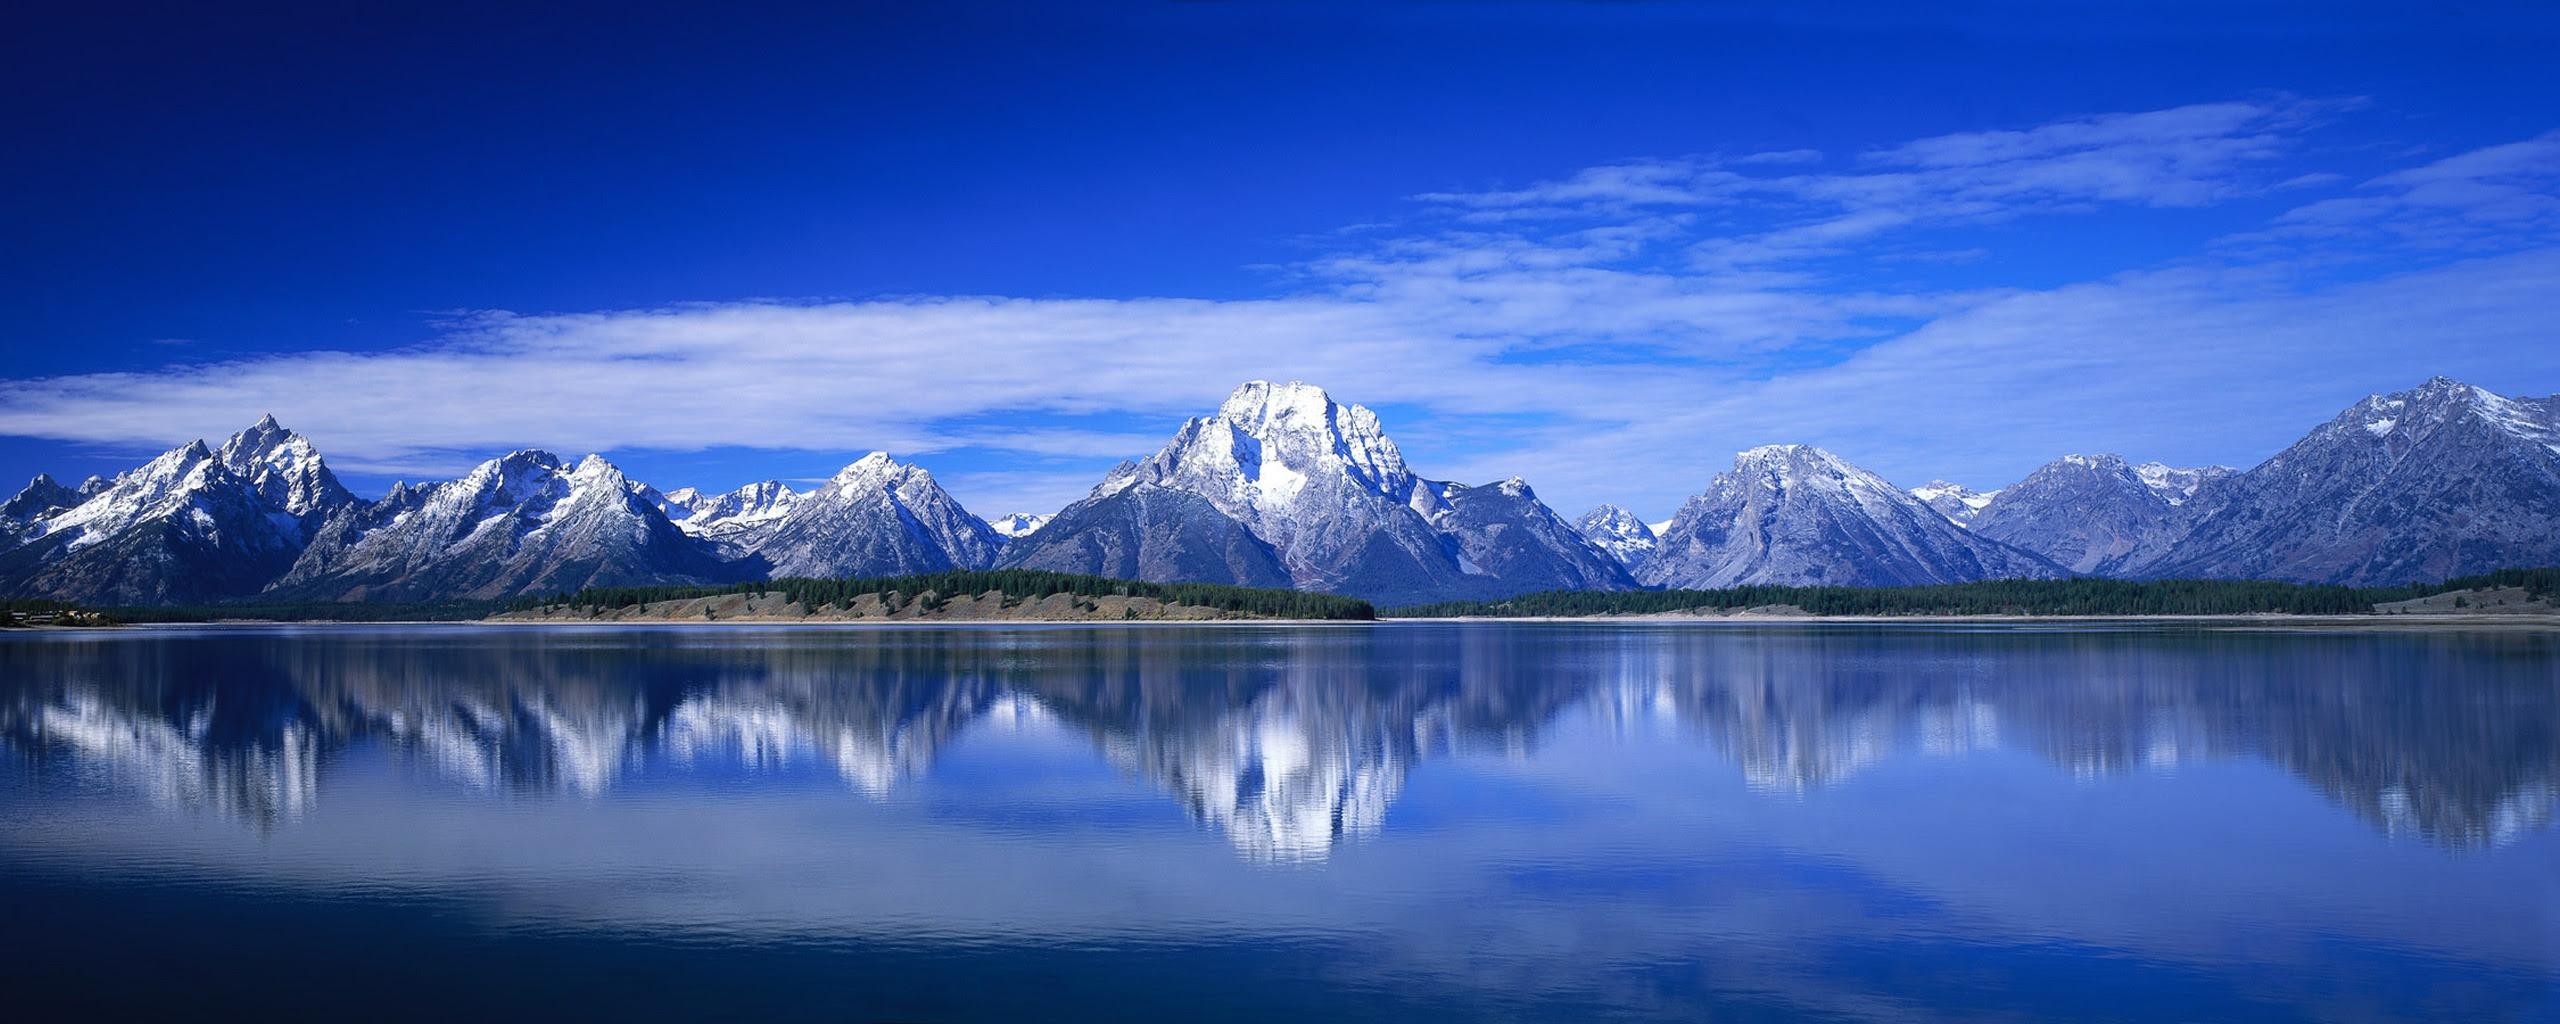 Panoramic Wallpaper Dual Monitor Mountain